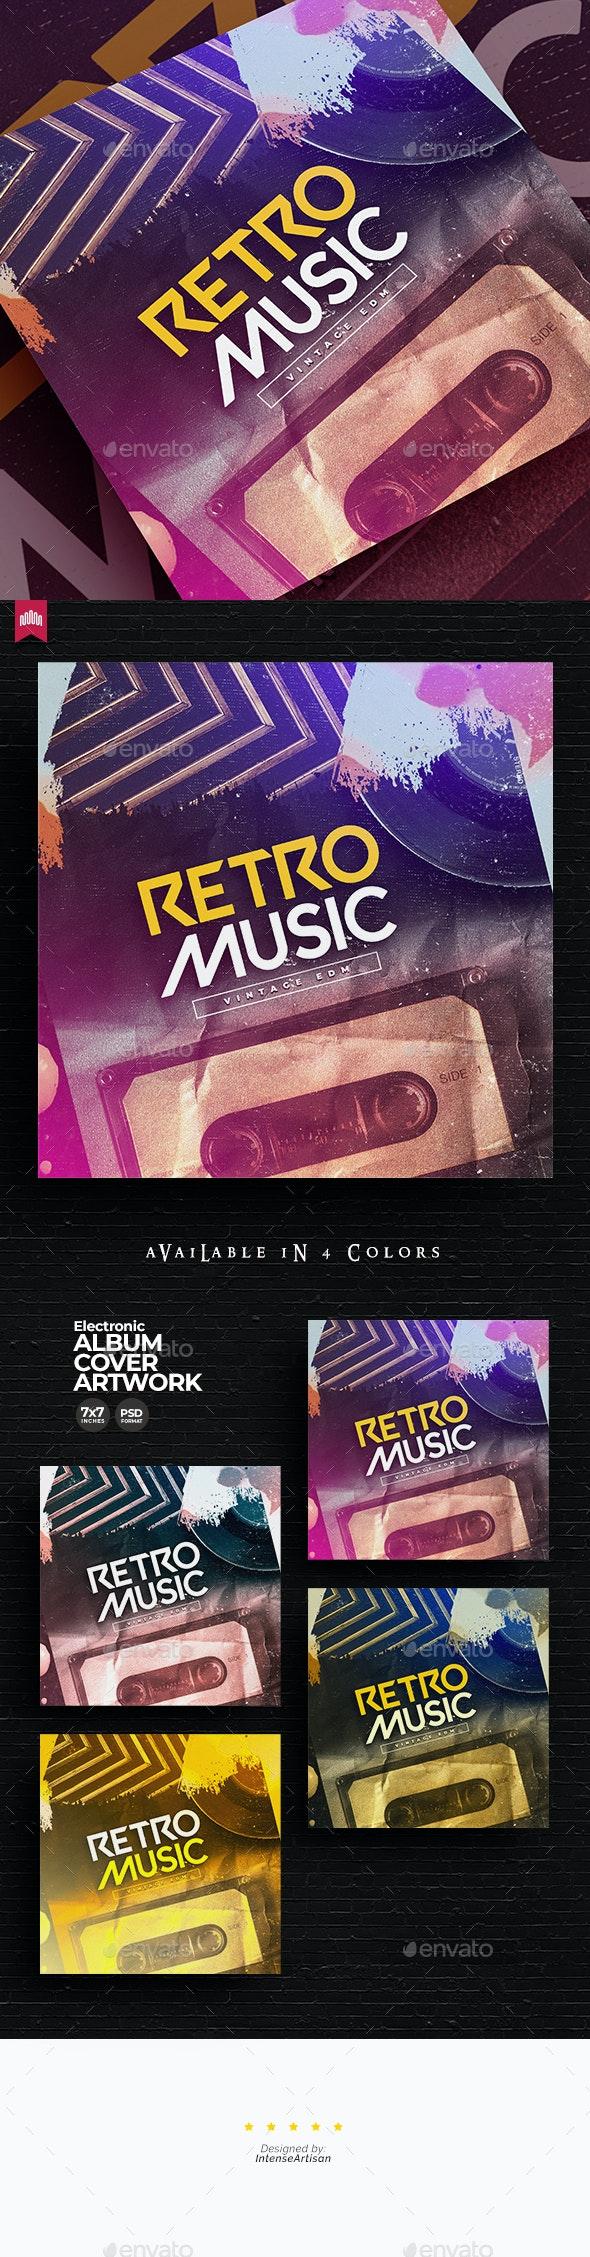 Retro Music Album Cover Artwork - Miscellaneous Social Media